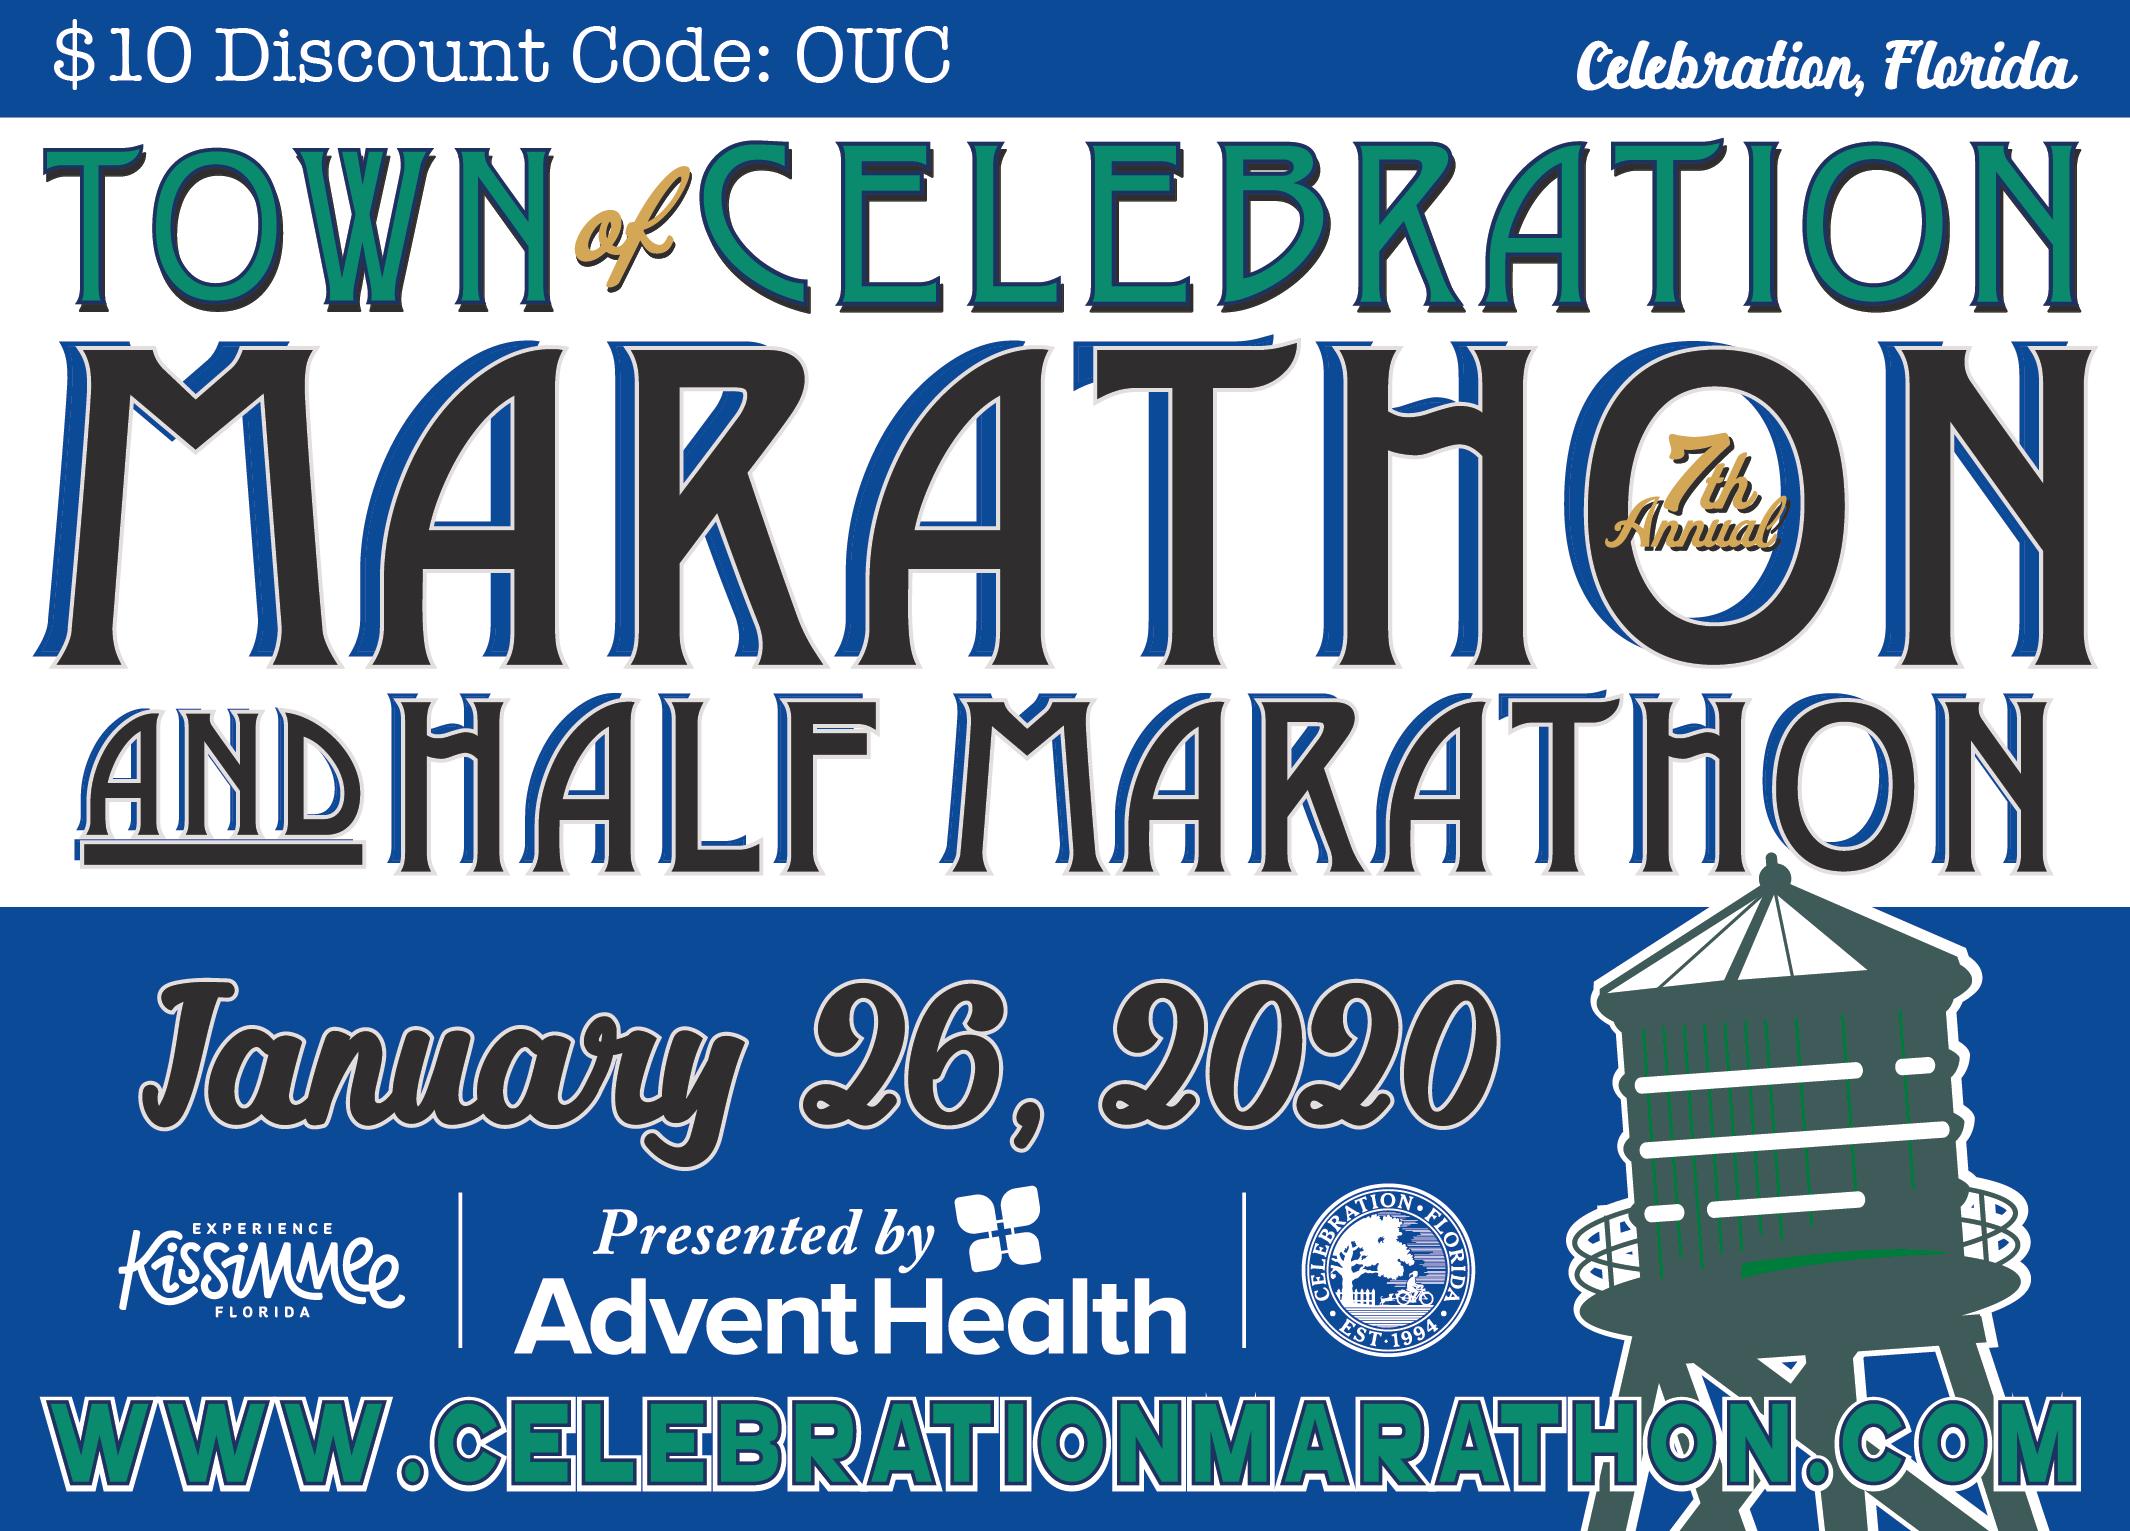 Celebration Marathon & Half